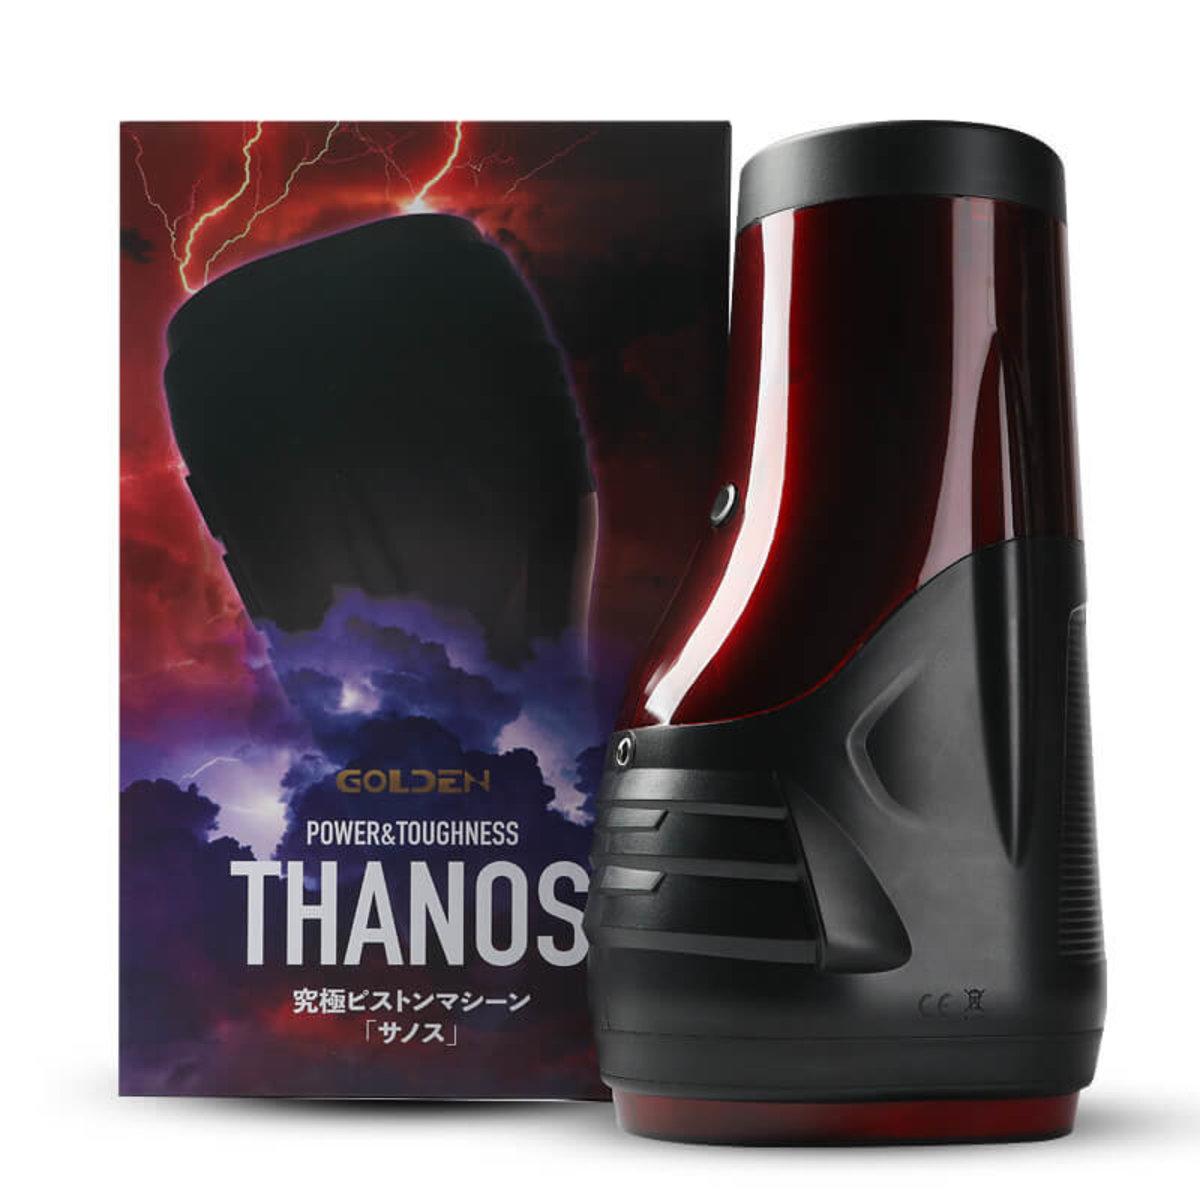 Rends Thanos Piston ELECTRIC MASTURBATOR